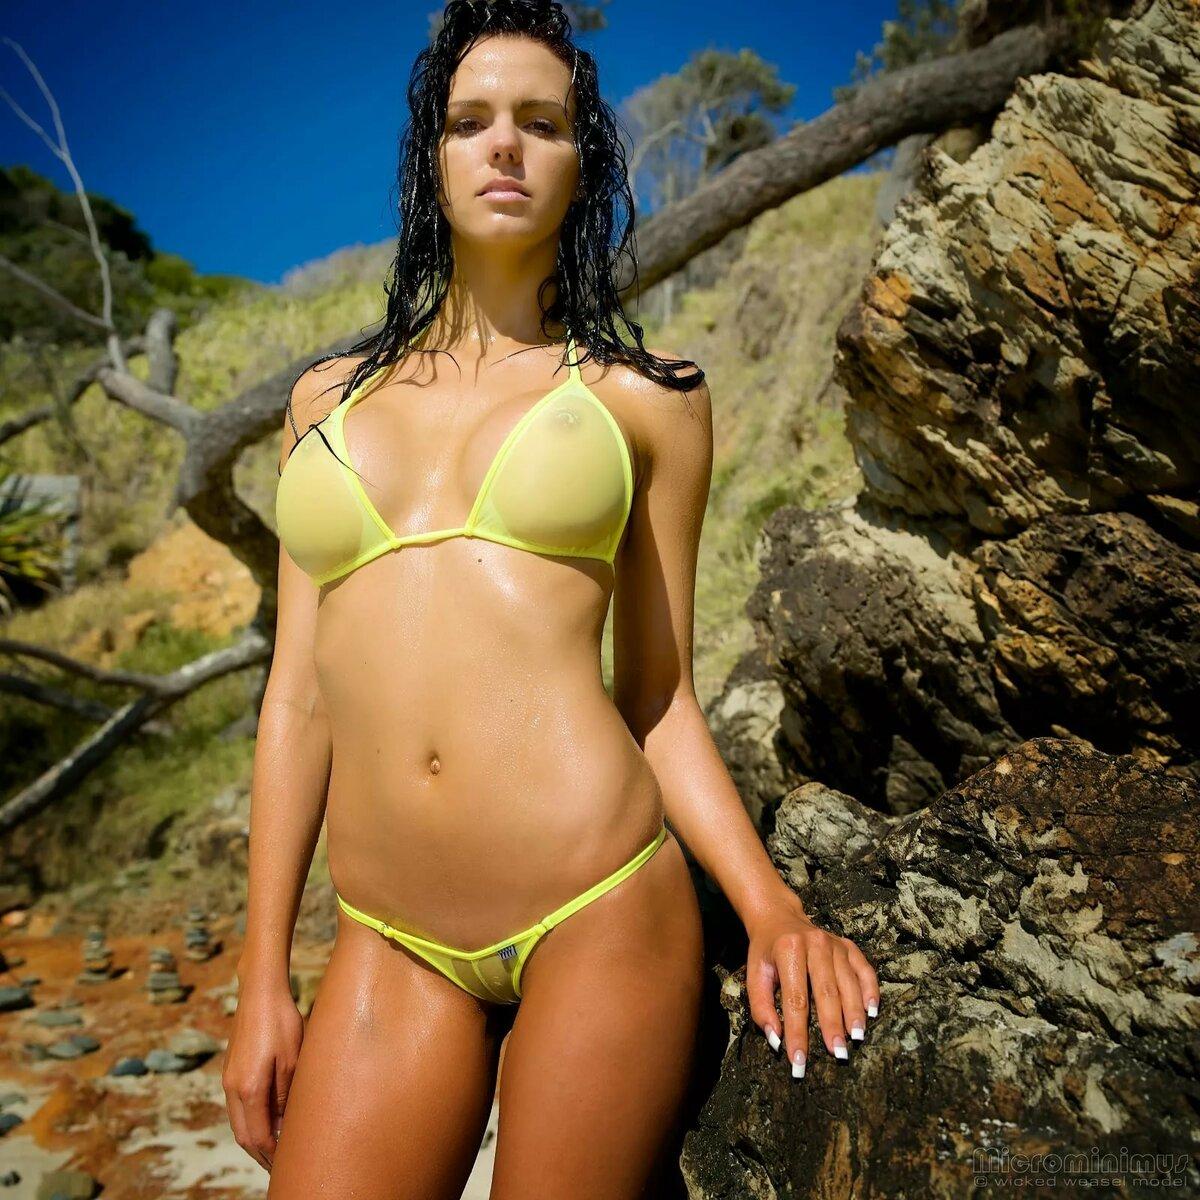 Wild weasel women bikini